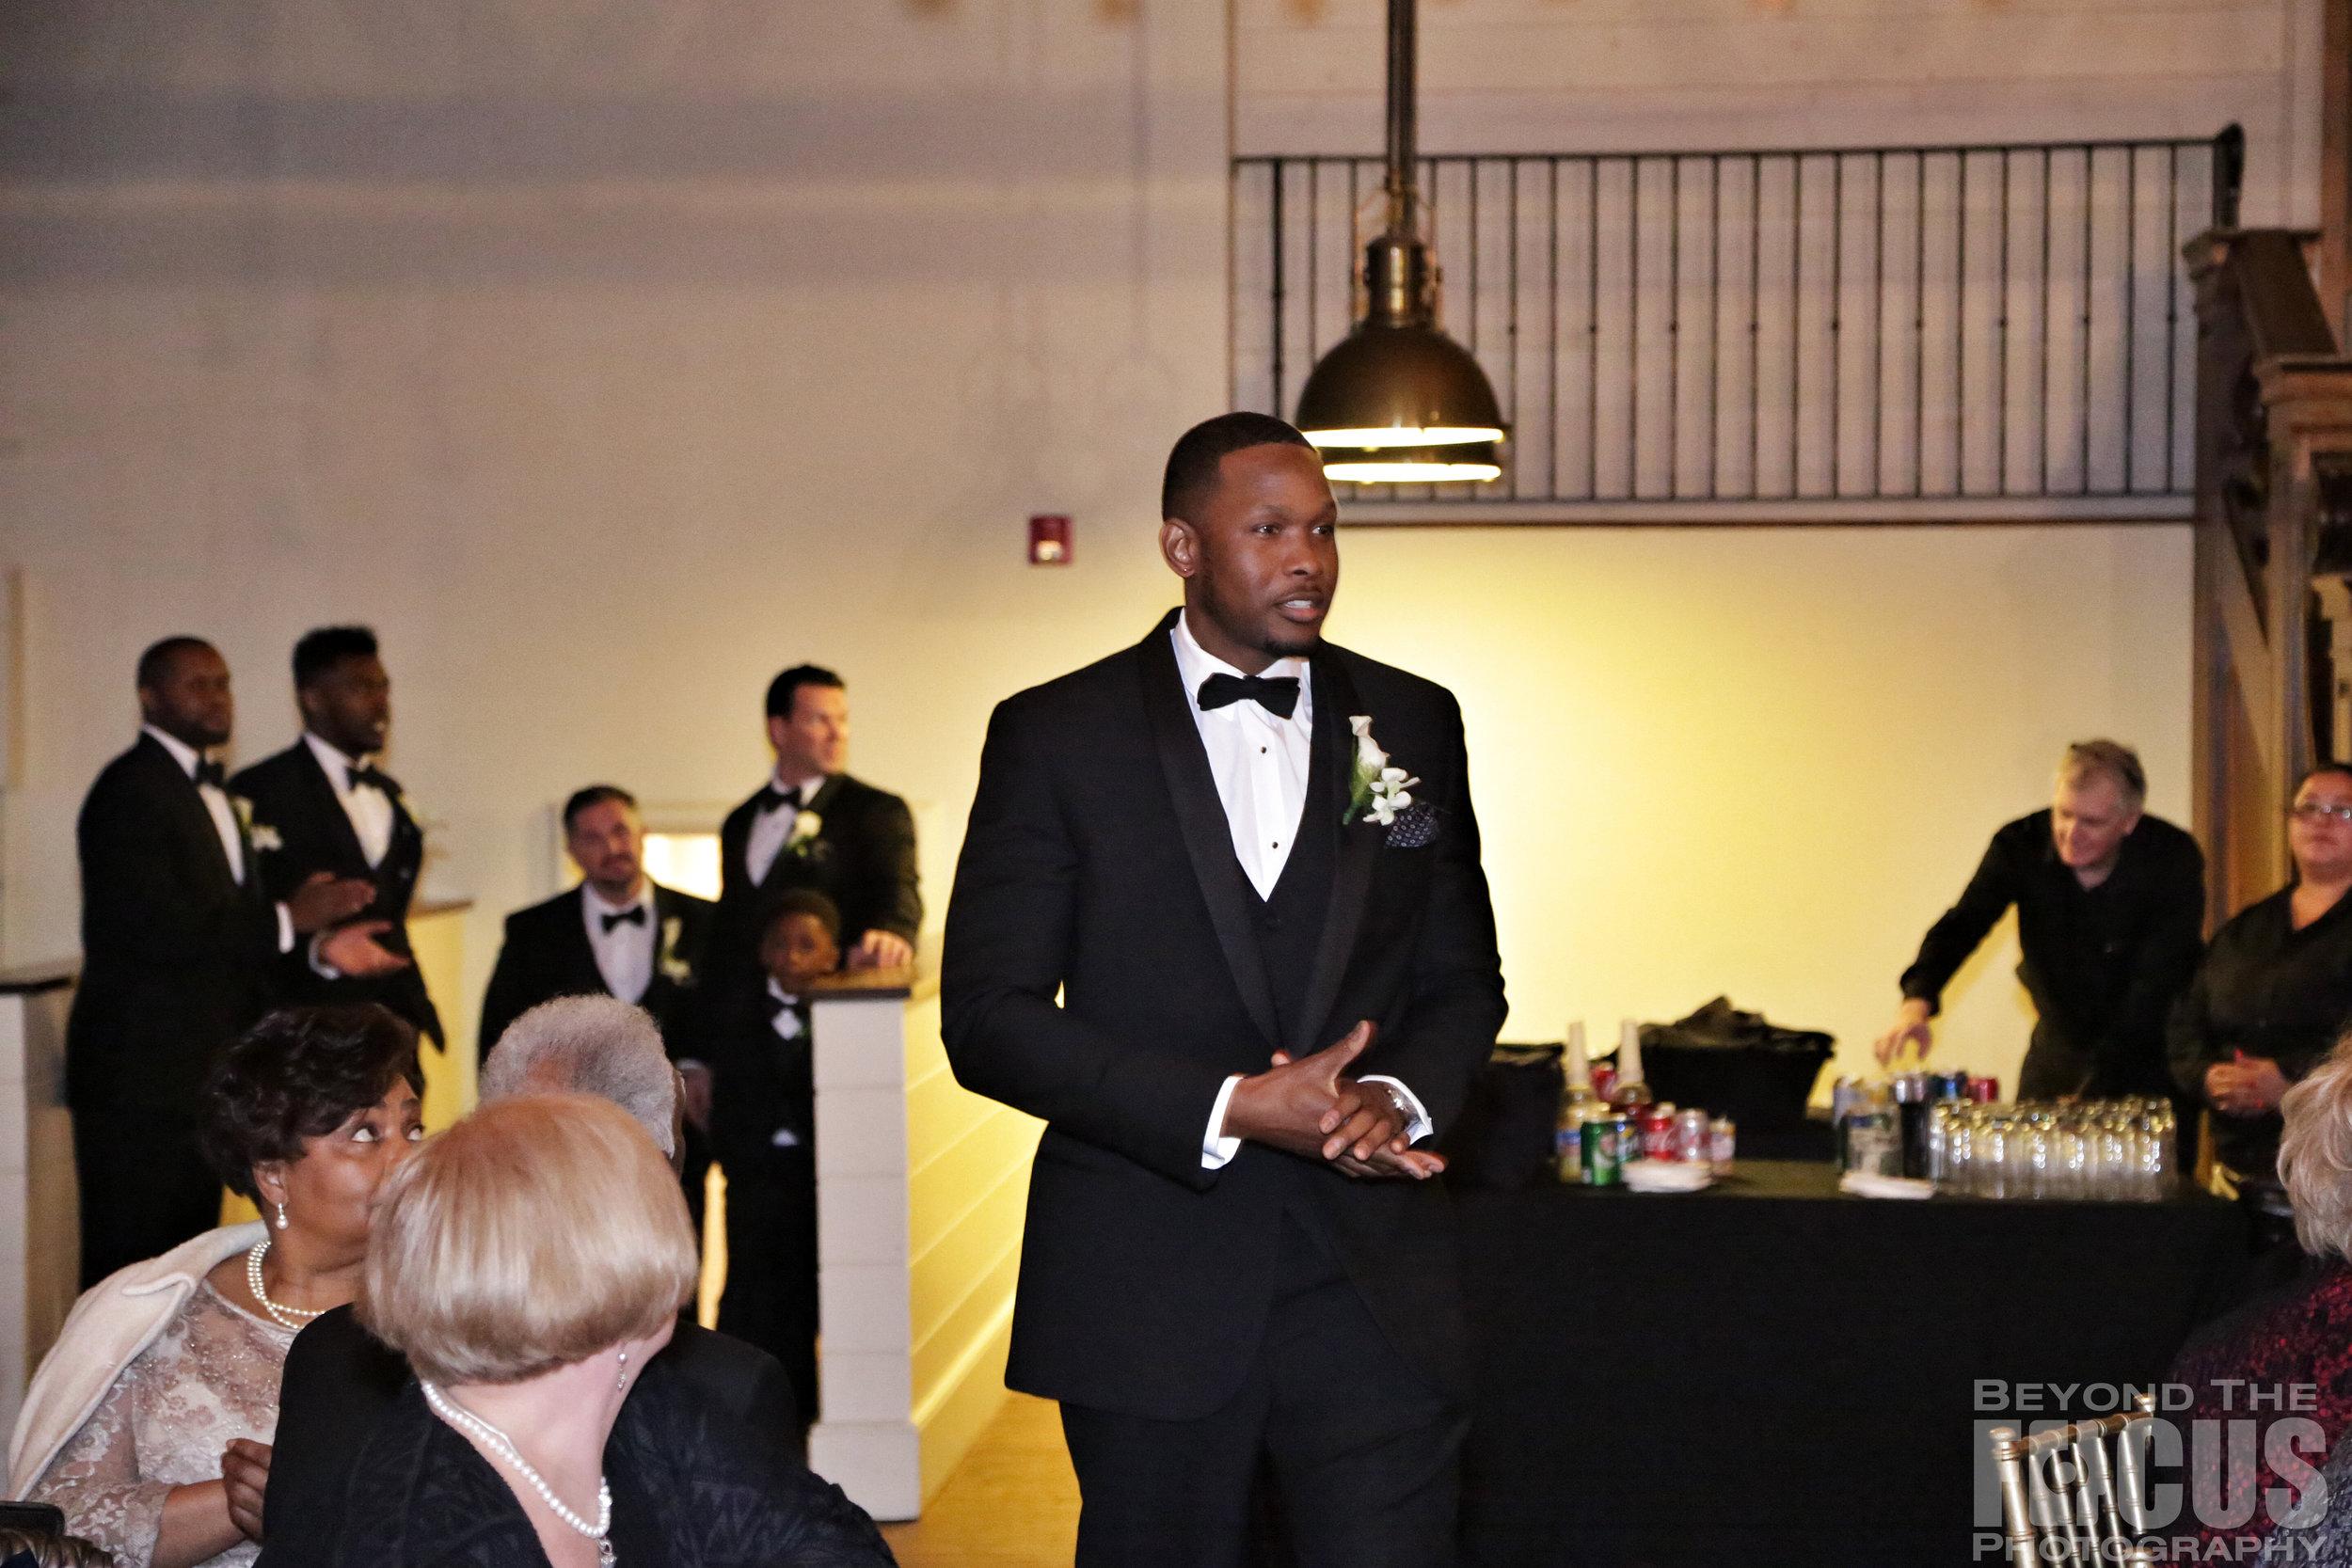 Matthews_Wedding_Reception_7.jpg